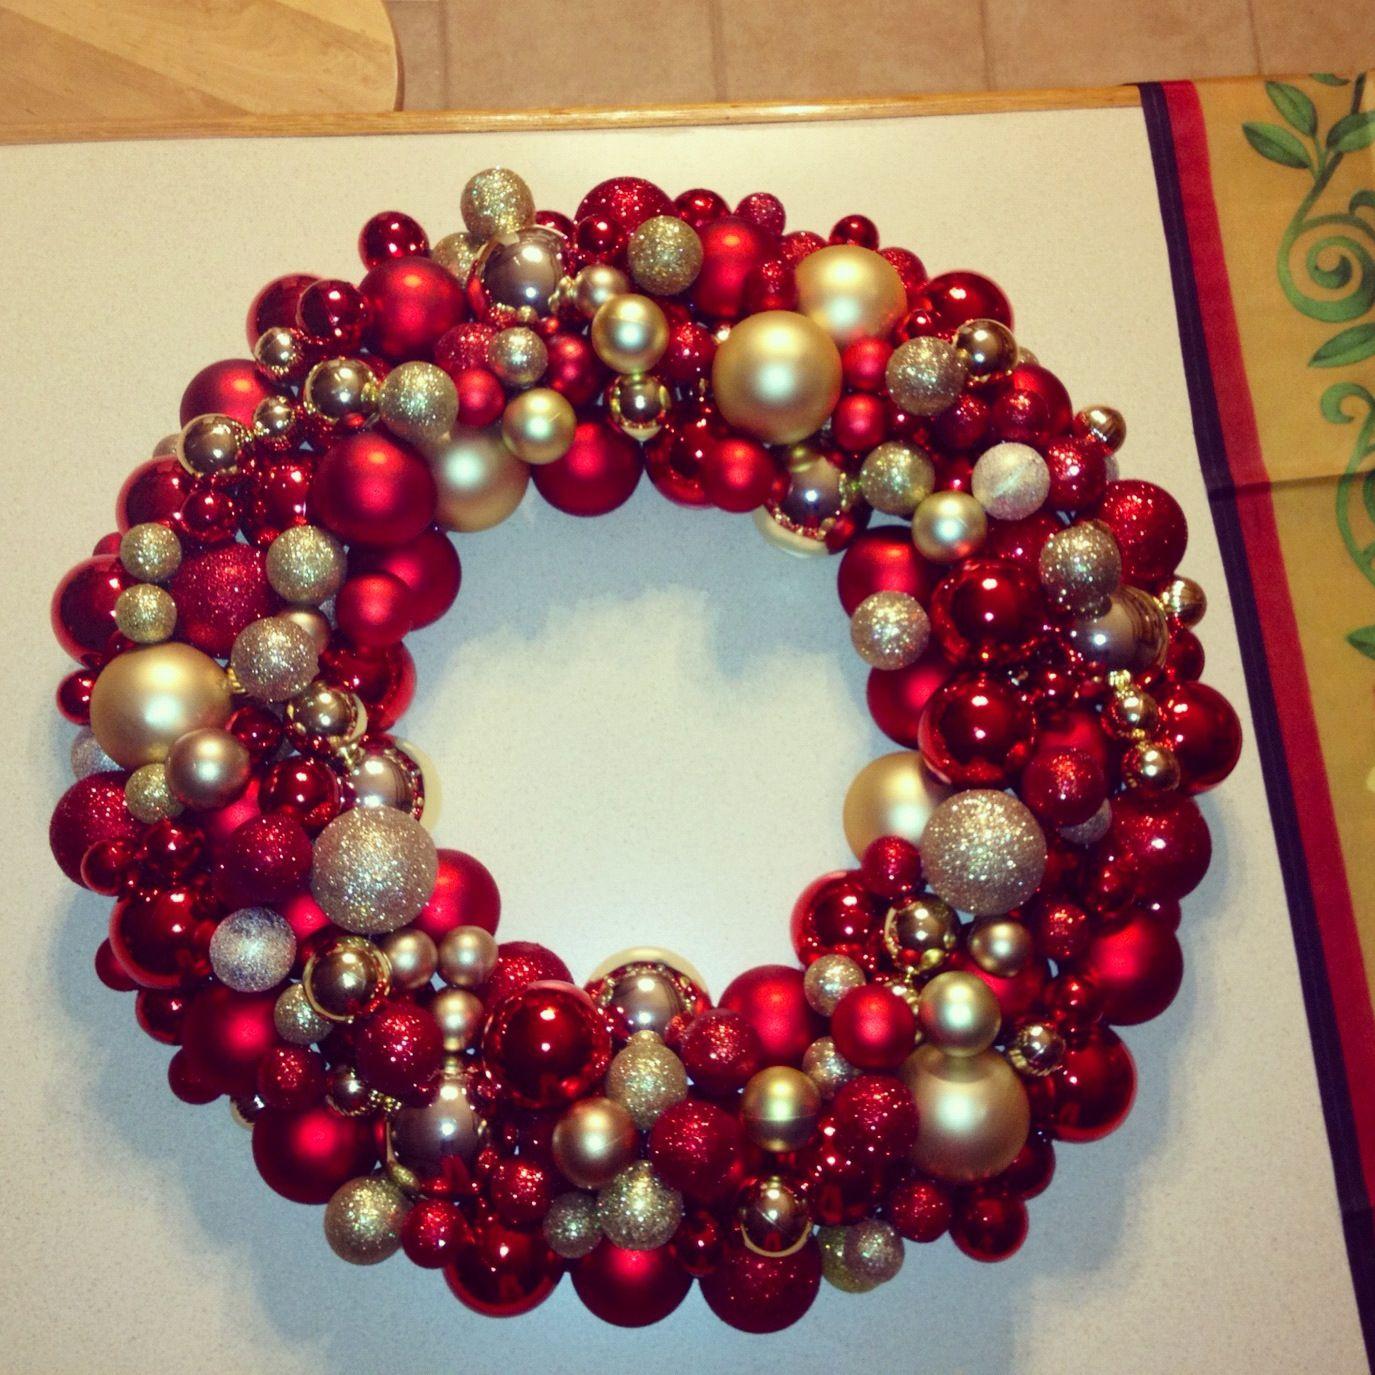 DIY: How to Make a Christmas Ball Wreath - Lehman Lane  |Christmas Ball Wreath